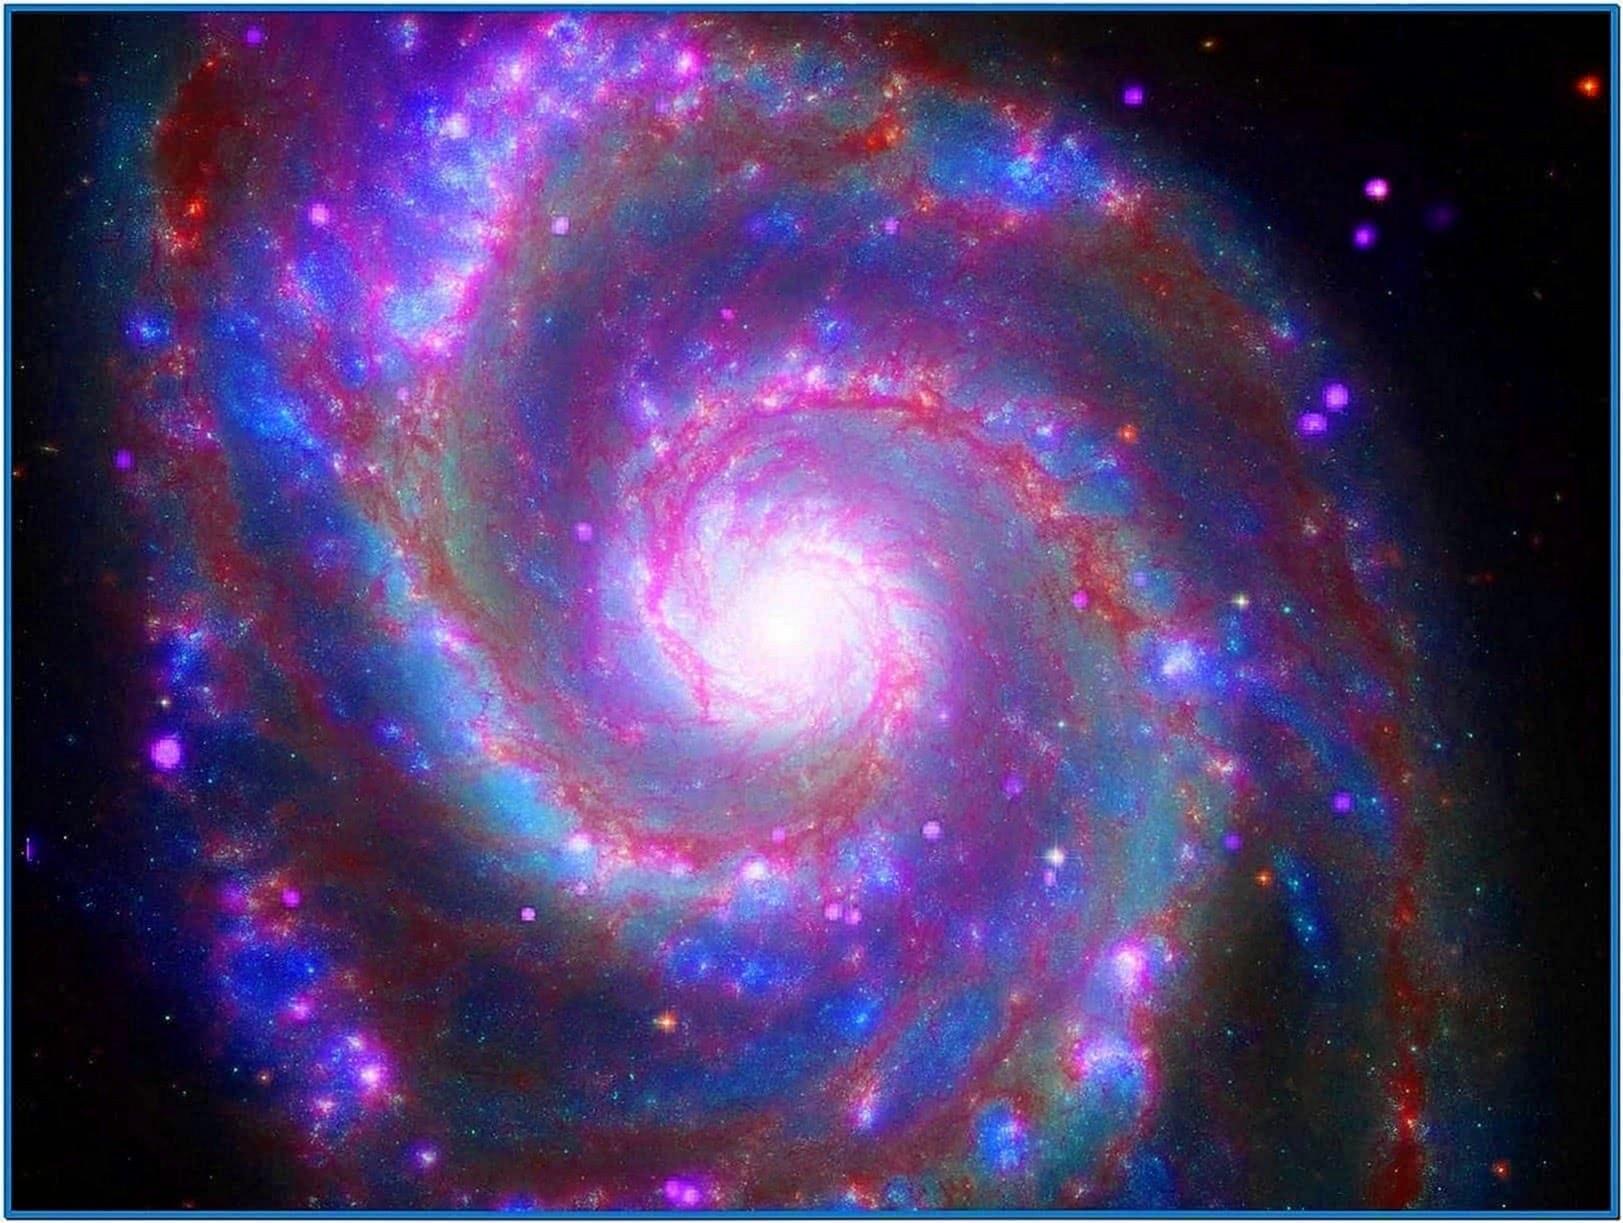 Galaxy Screensaver Moving